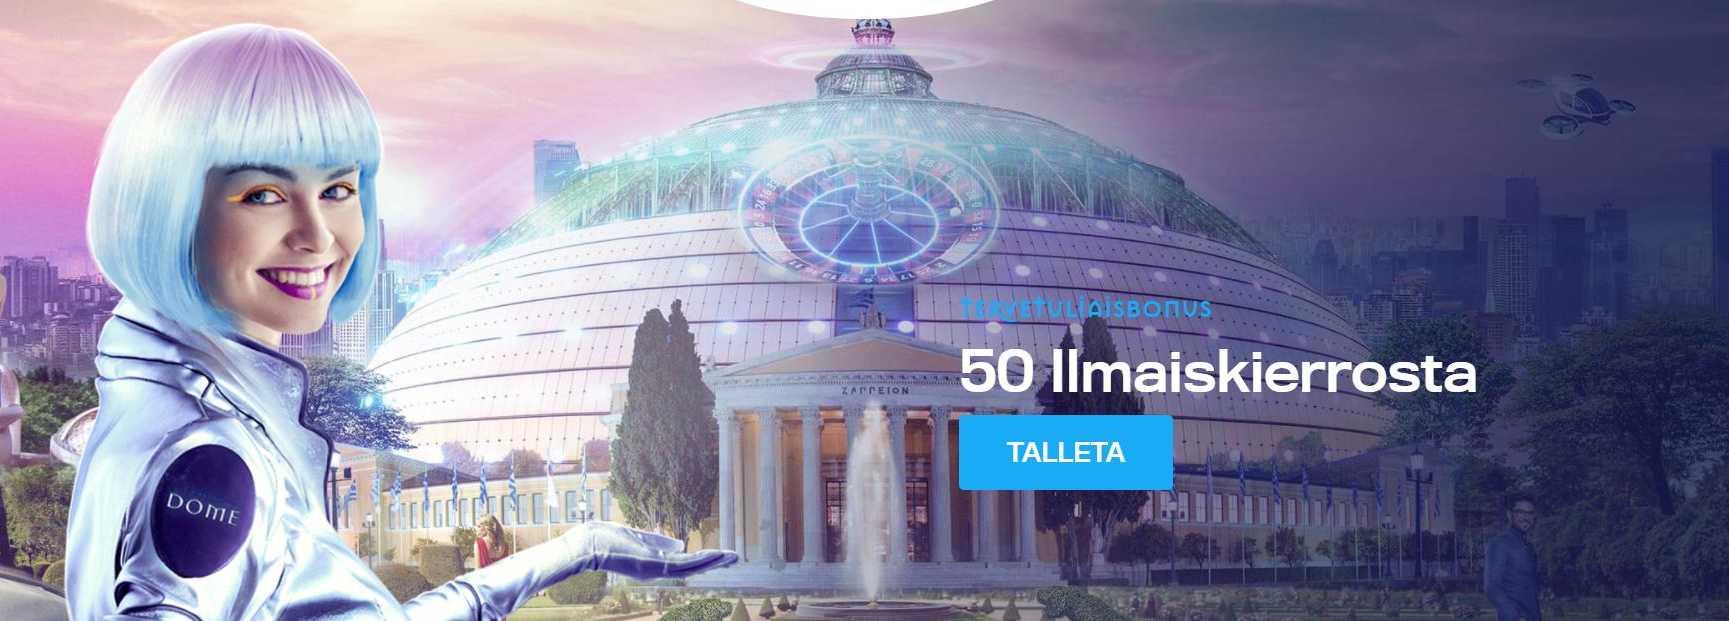 Casino Dome tervetulobonus